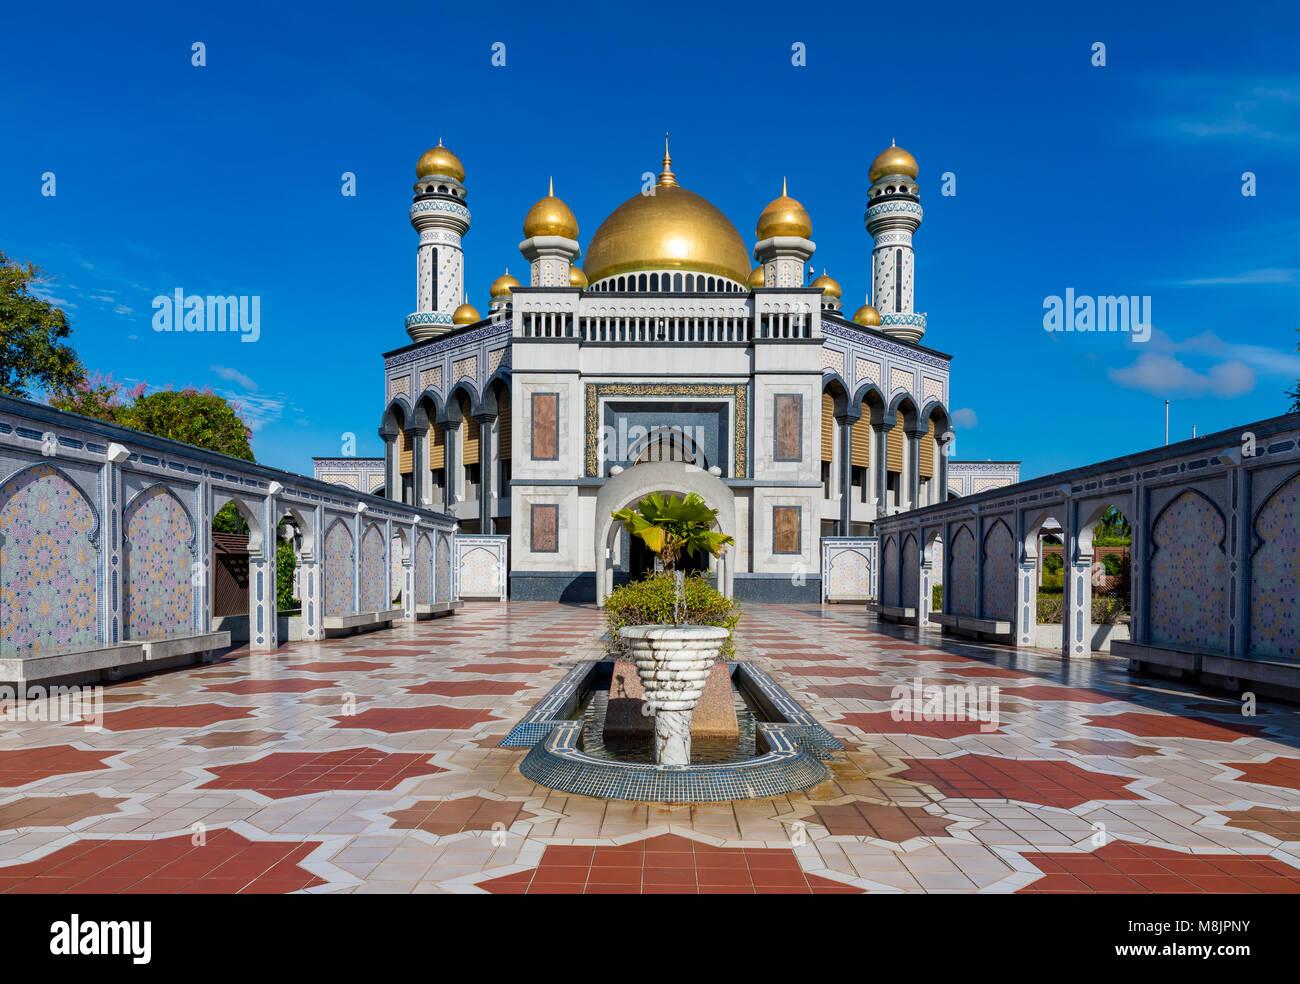 Brunei Darussalam Bandar Seri Begawan Marzo 17, 2018 Jame'ASR Hassanil Bolkiah una moschea del Brunei è Immagini Stock